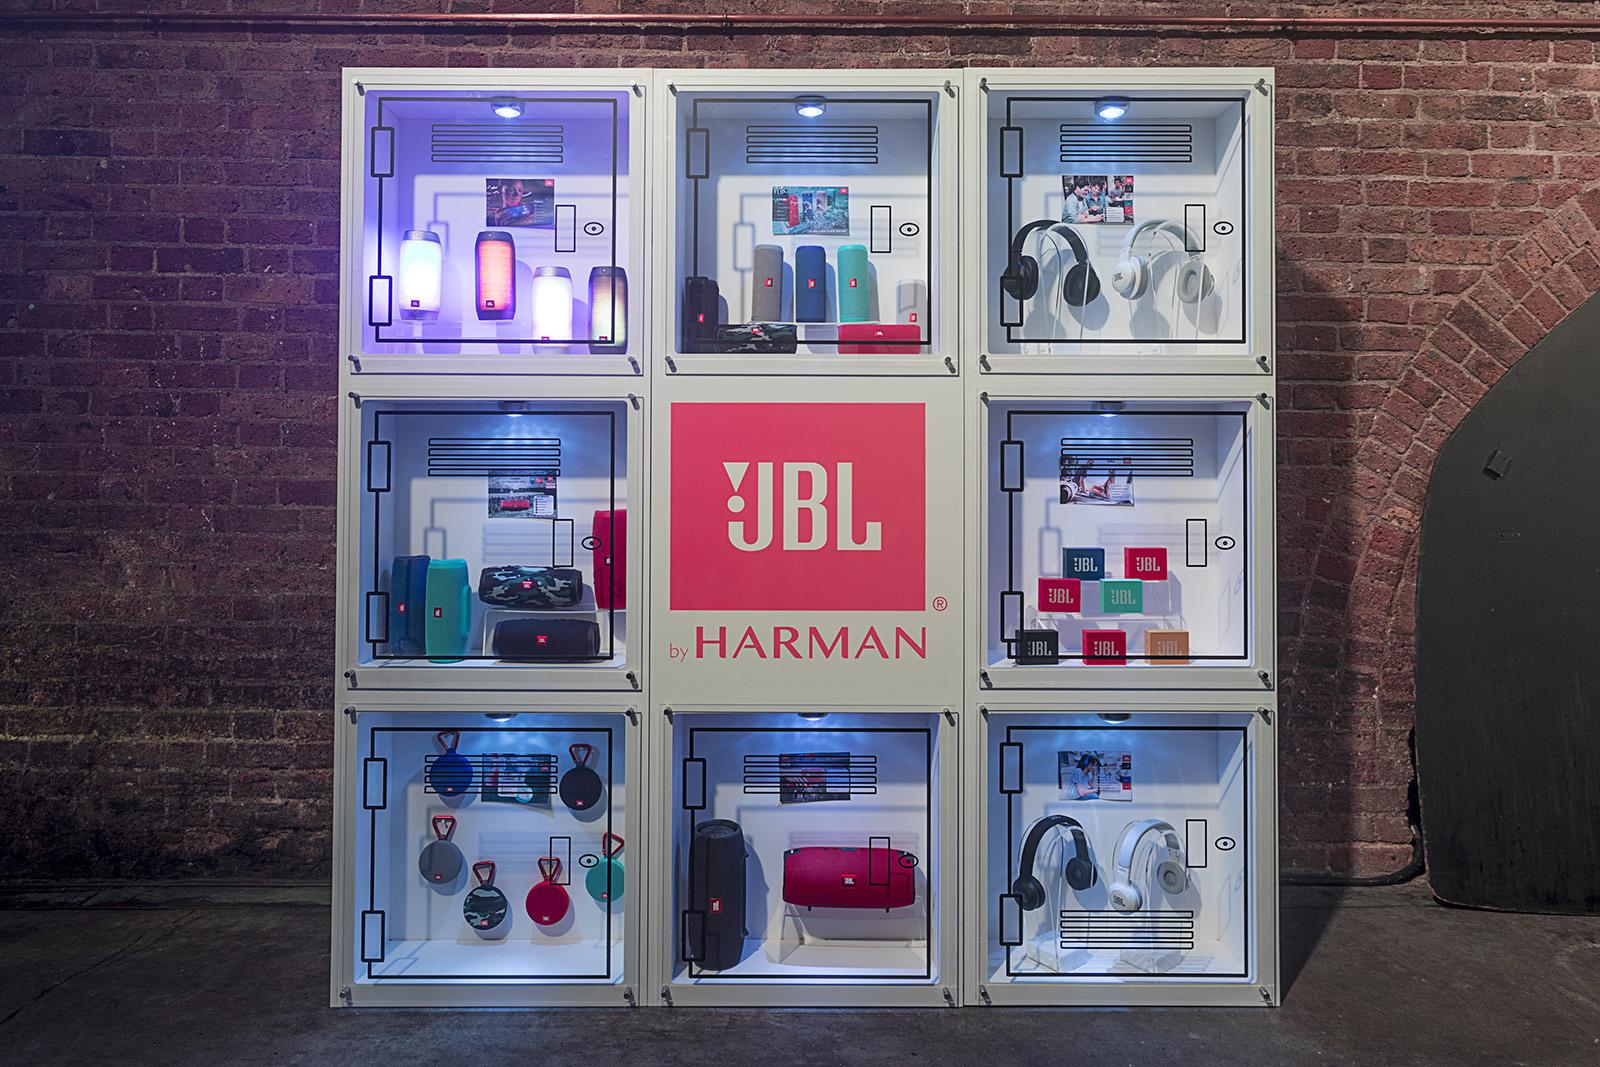 JBL-1600-7